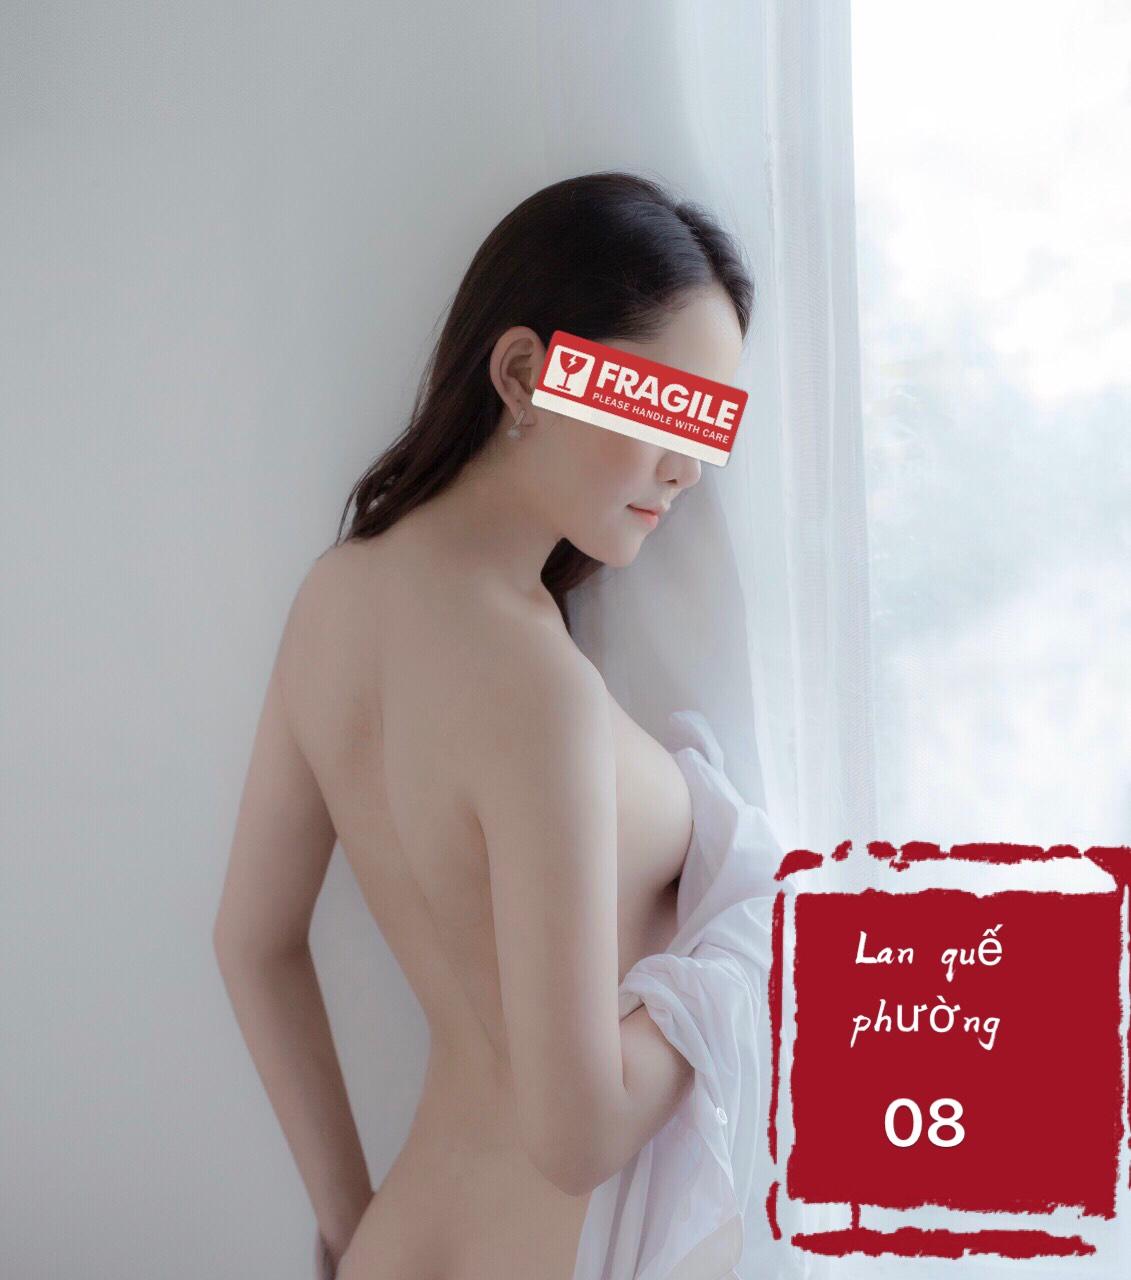 08-lqp-jpg.3848